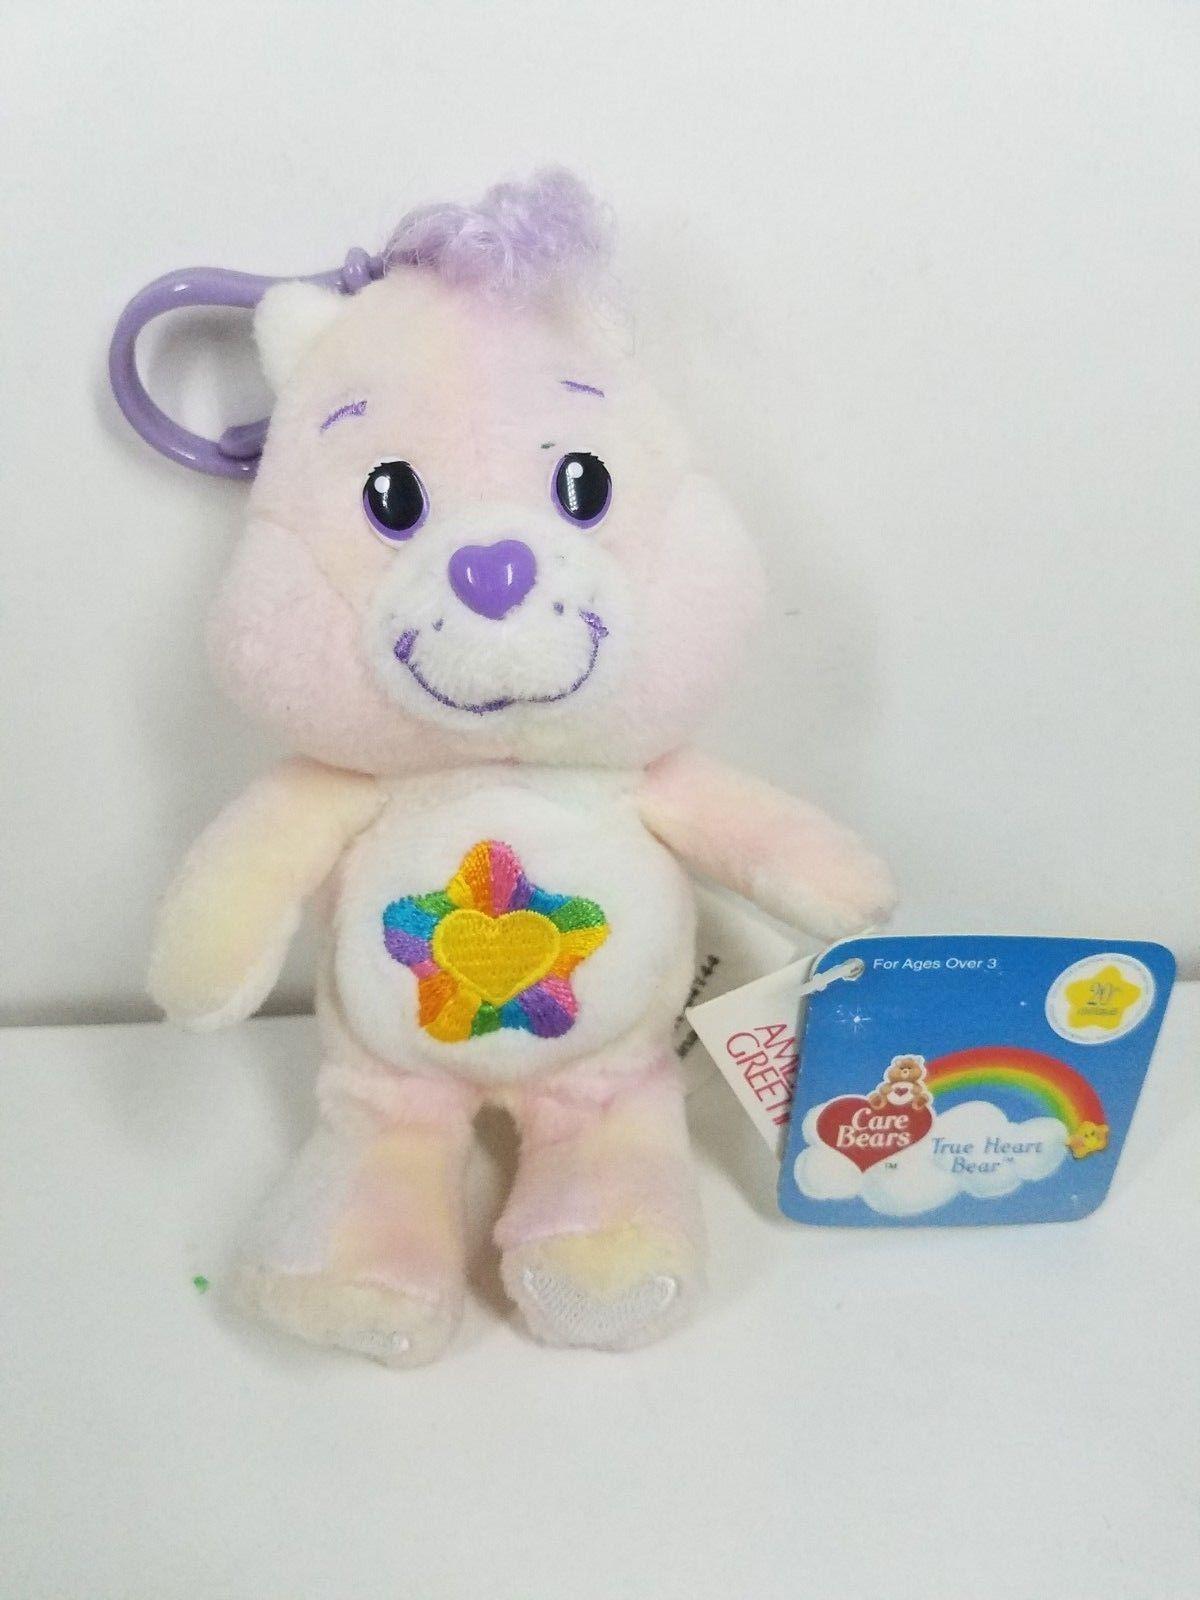 Kidrobot Care Bears Unbearably Cute Keychain Series Heart Song Figure NEW